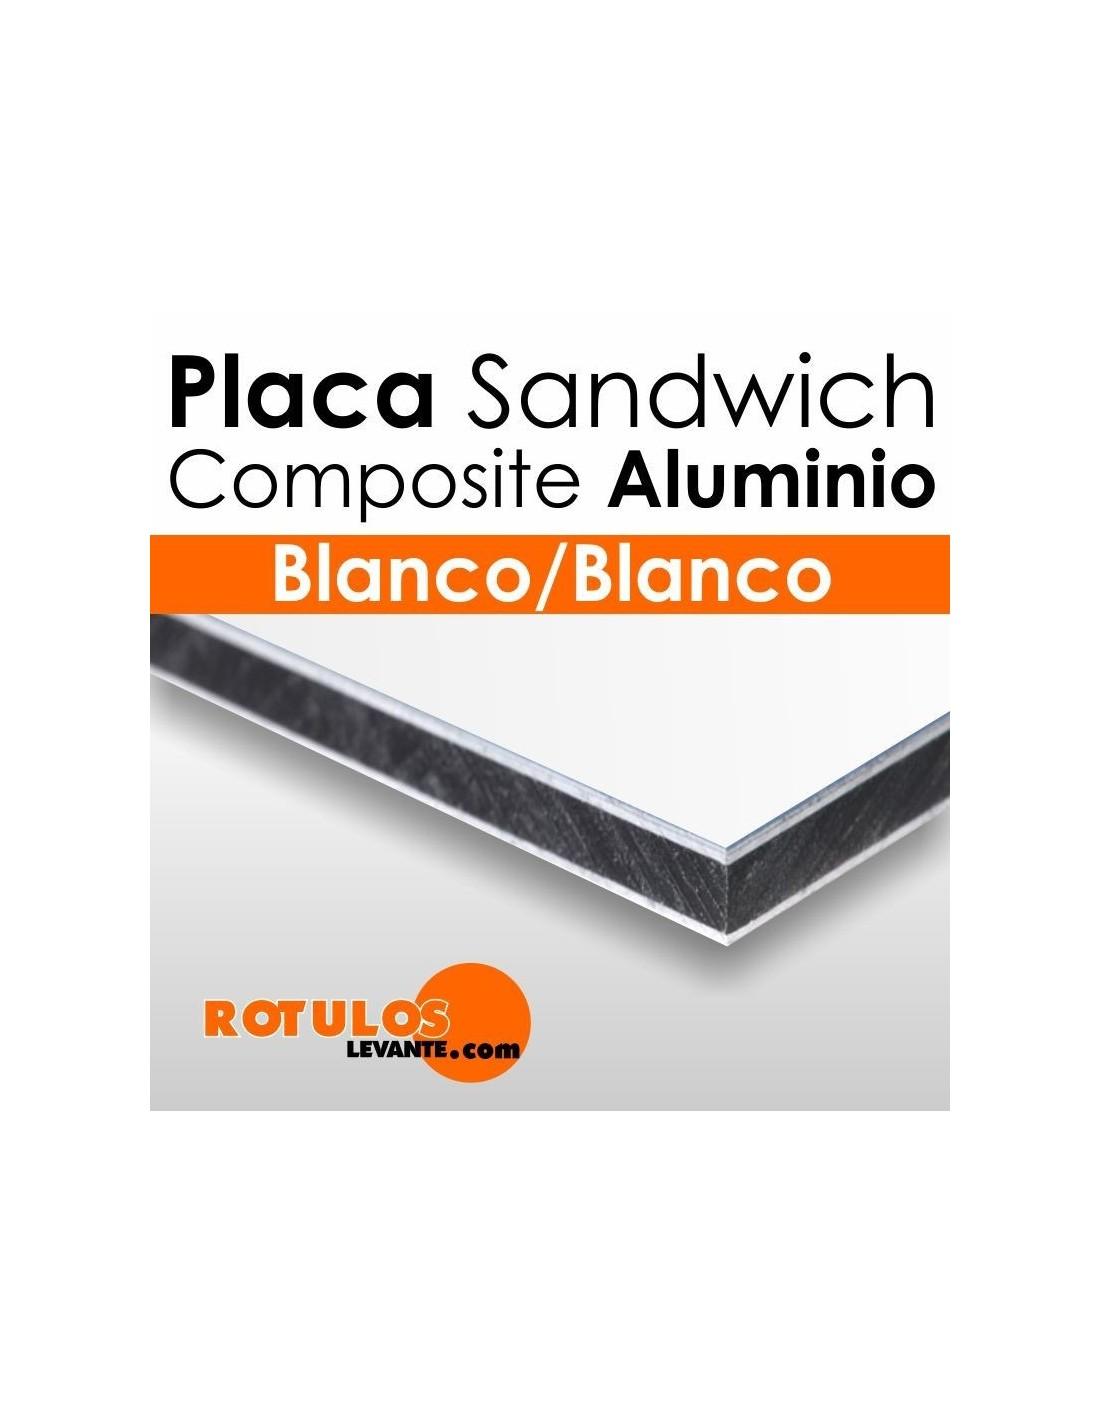 Placa aluminio comp site blanco online - Placas de aluminio ...